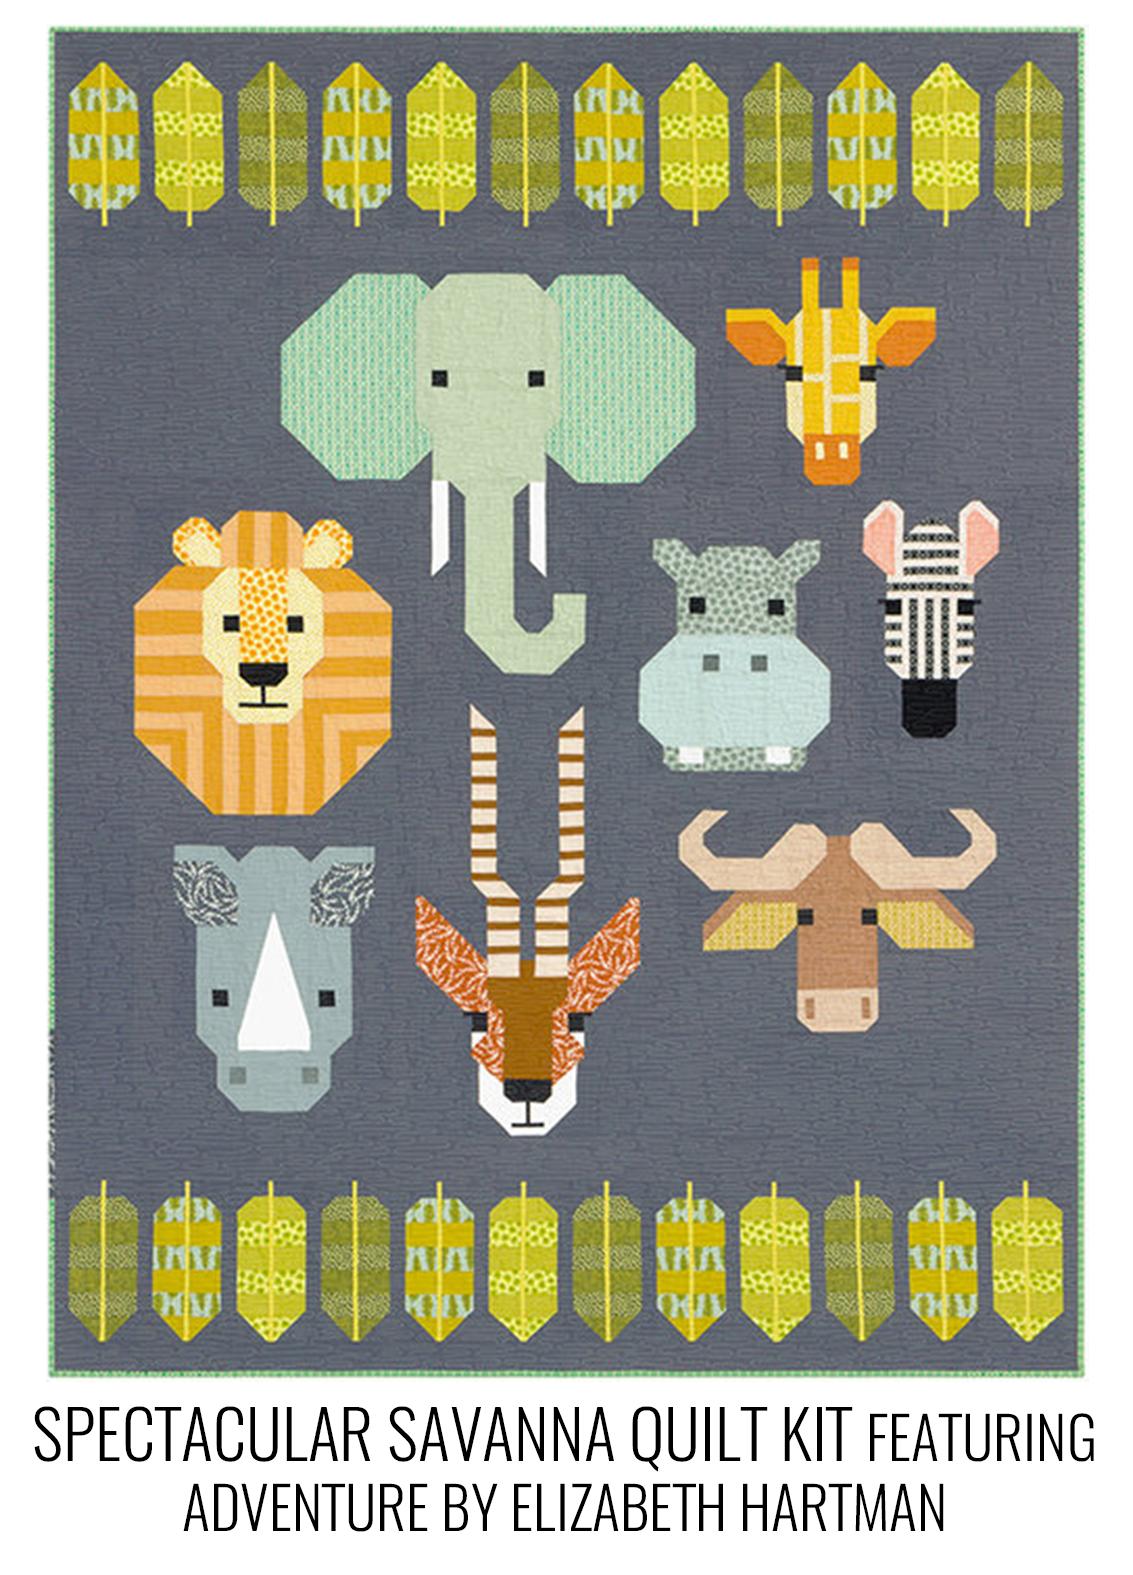 Spectacular savanna quilt kit